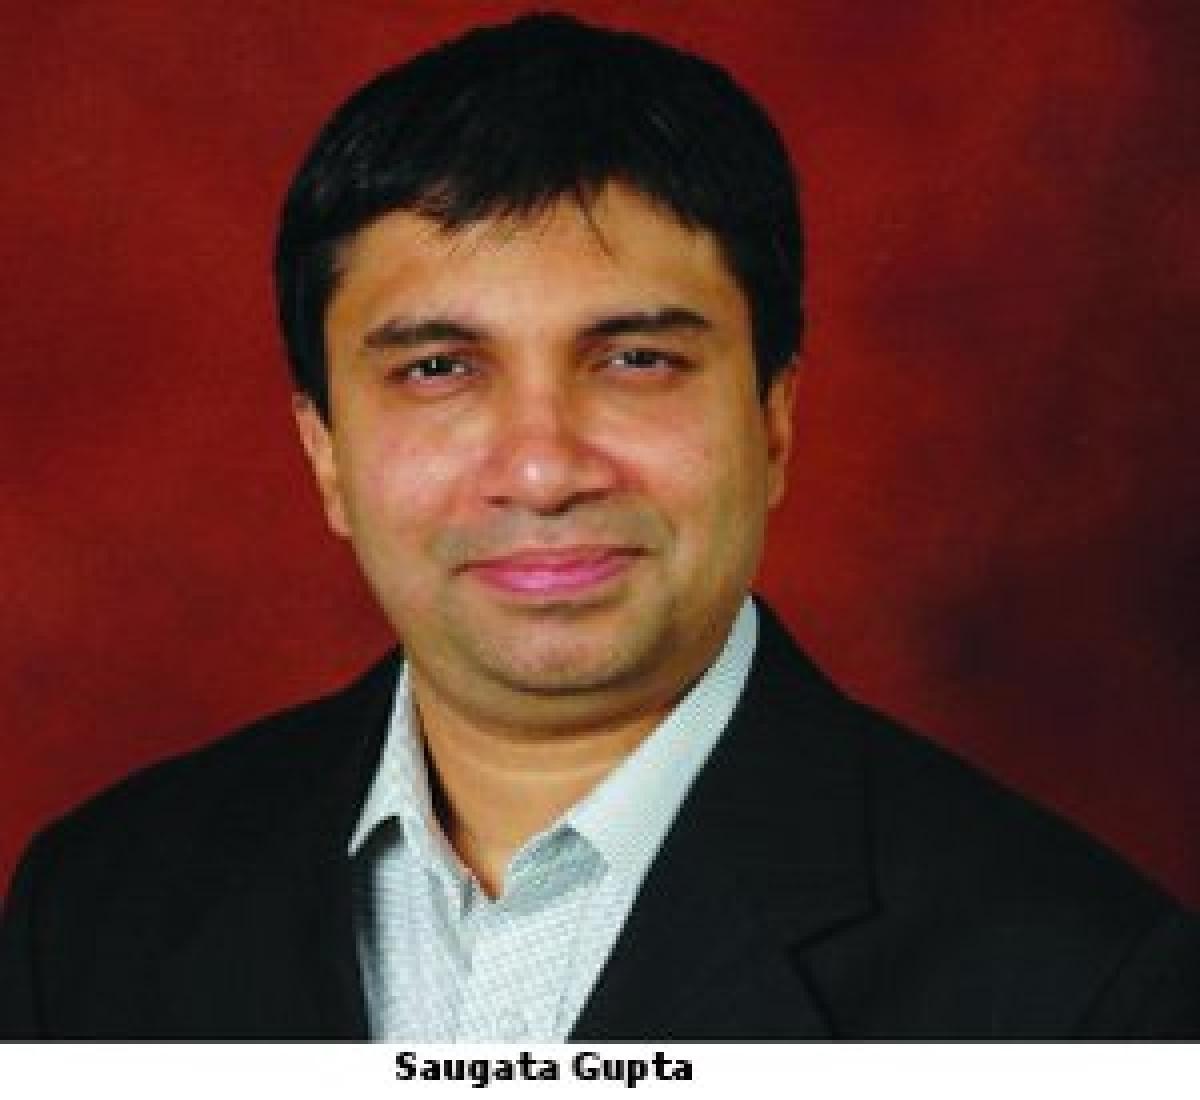 Saugata Gupta takes charge of ISA as chairman